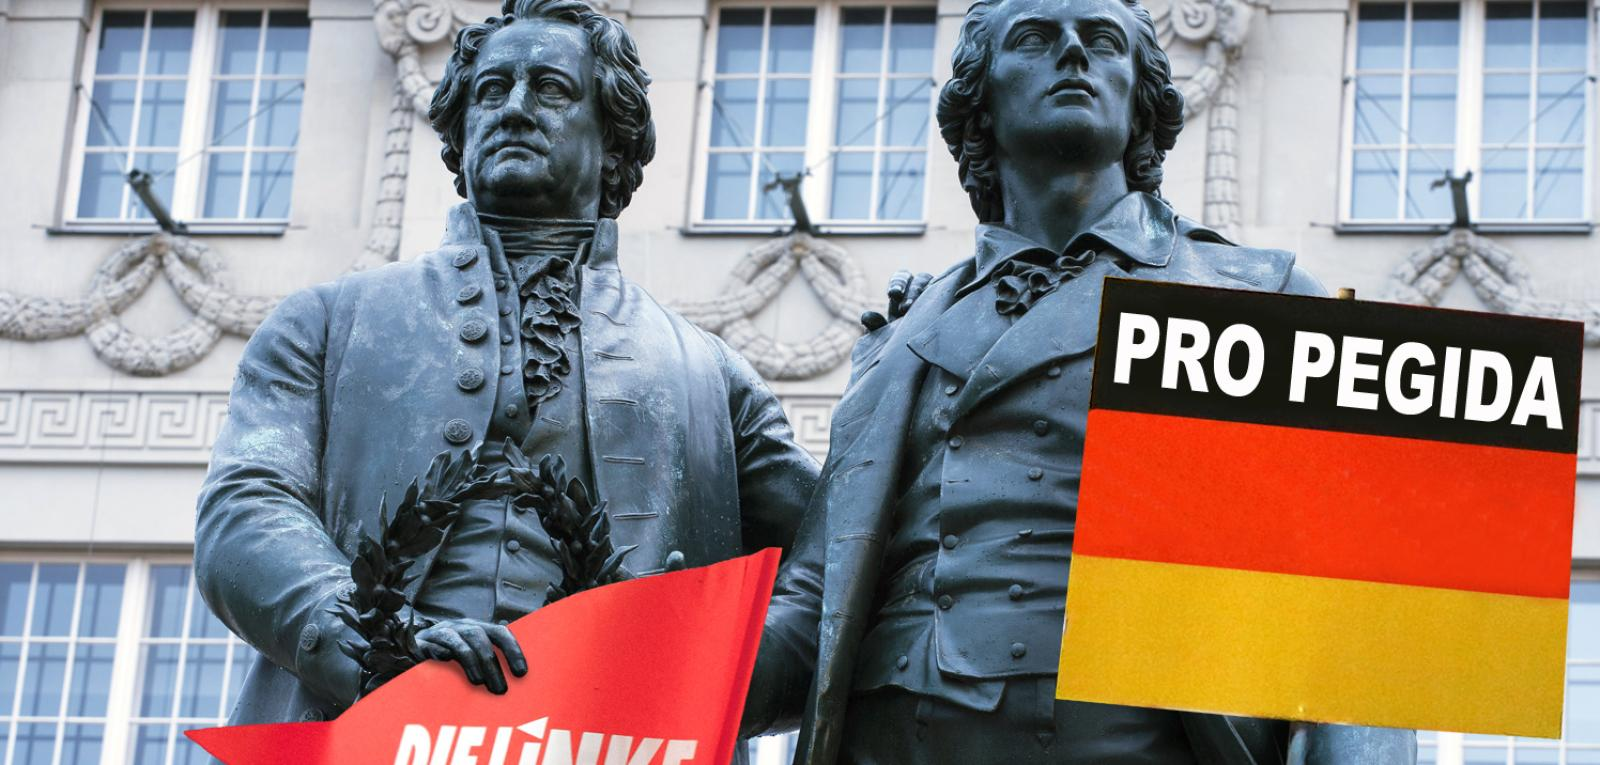 Balkan i Evropa: moćno ogledalo promena